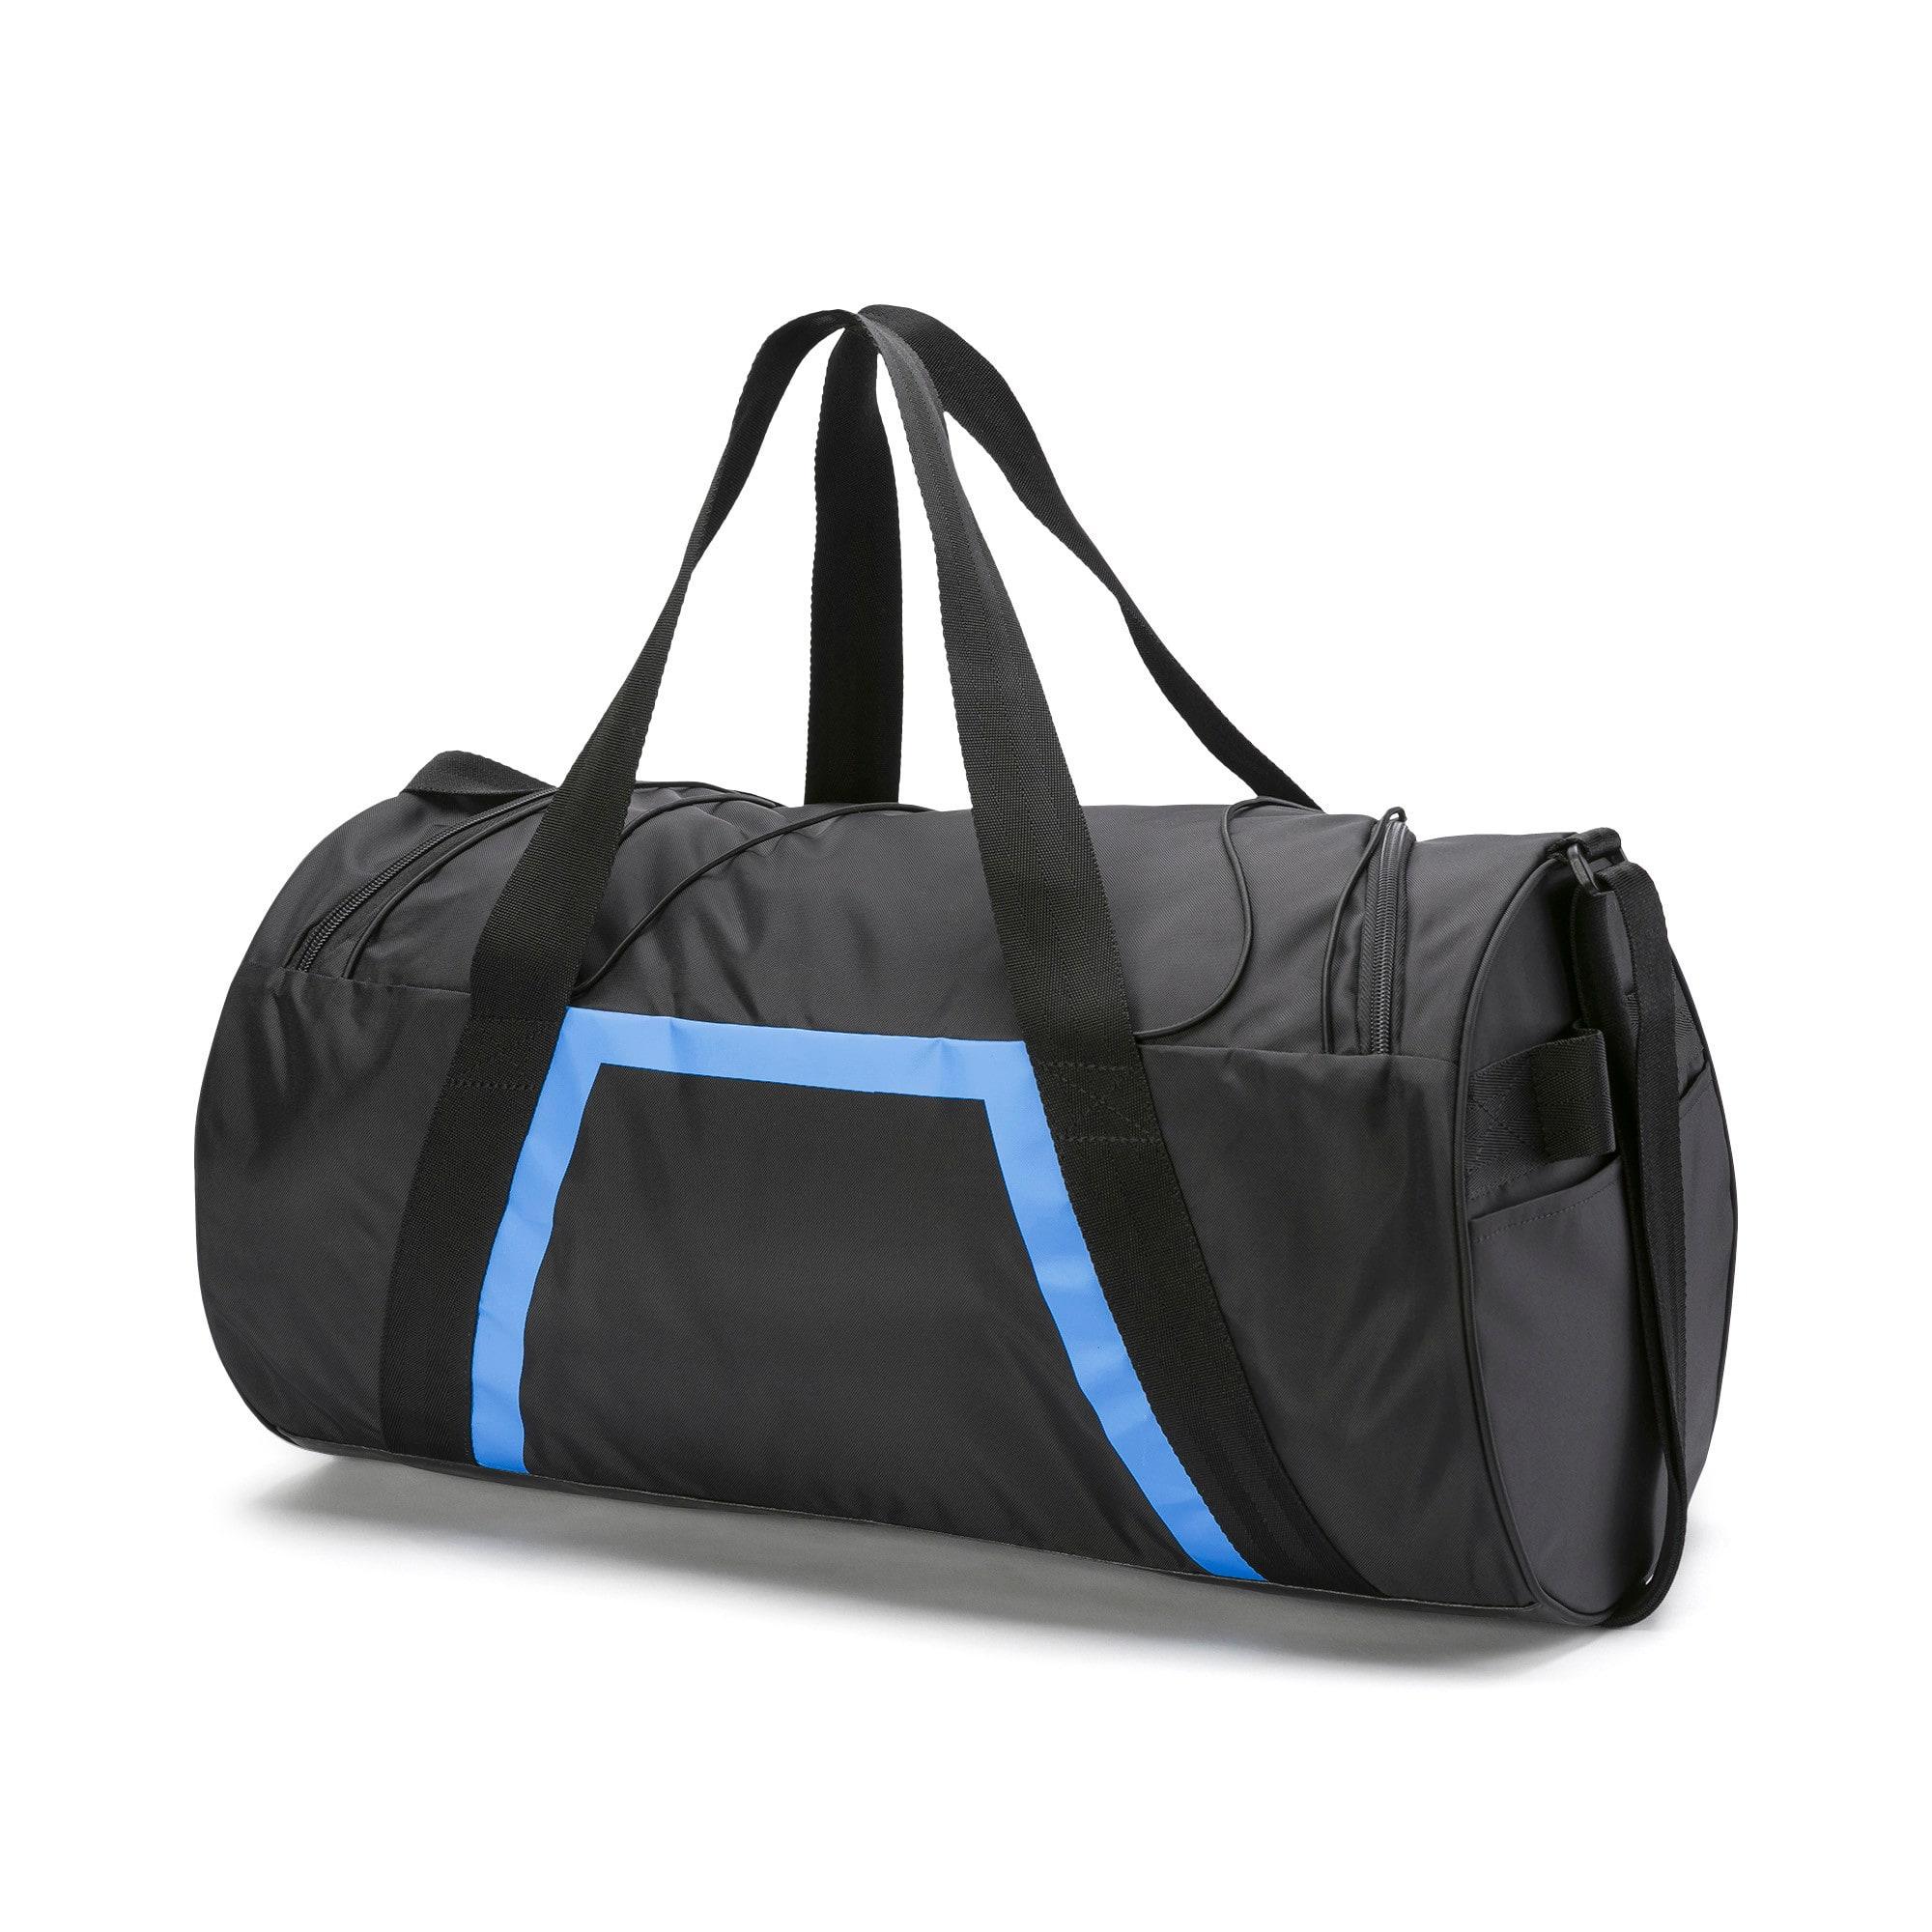 Thumbnail 3 of AT Shift Duffel Bag, Puma Black-Blue Glimmer, medium